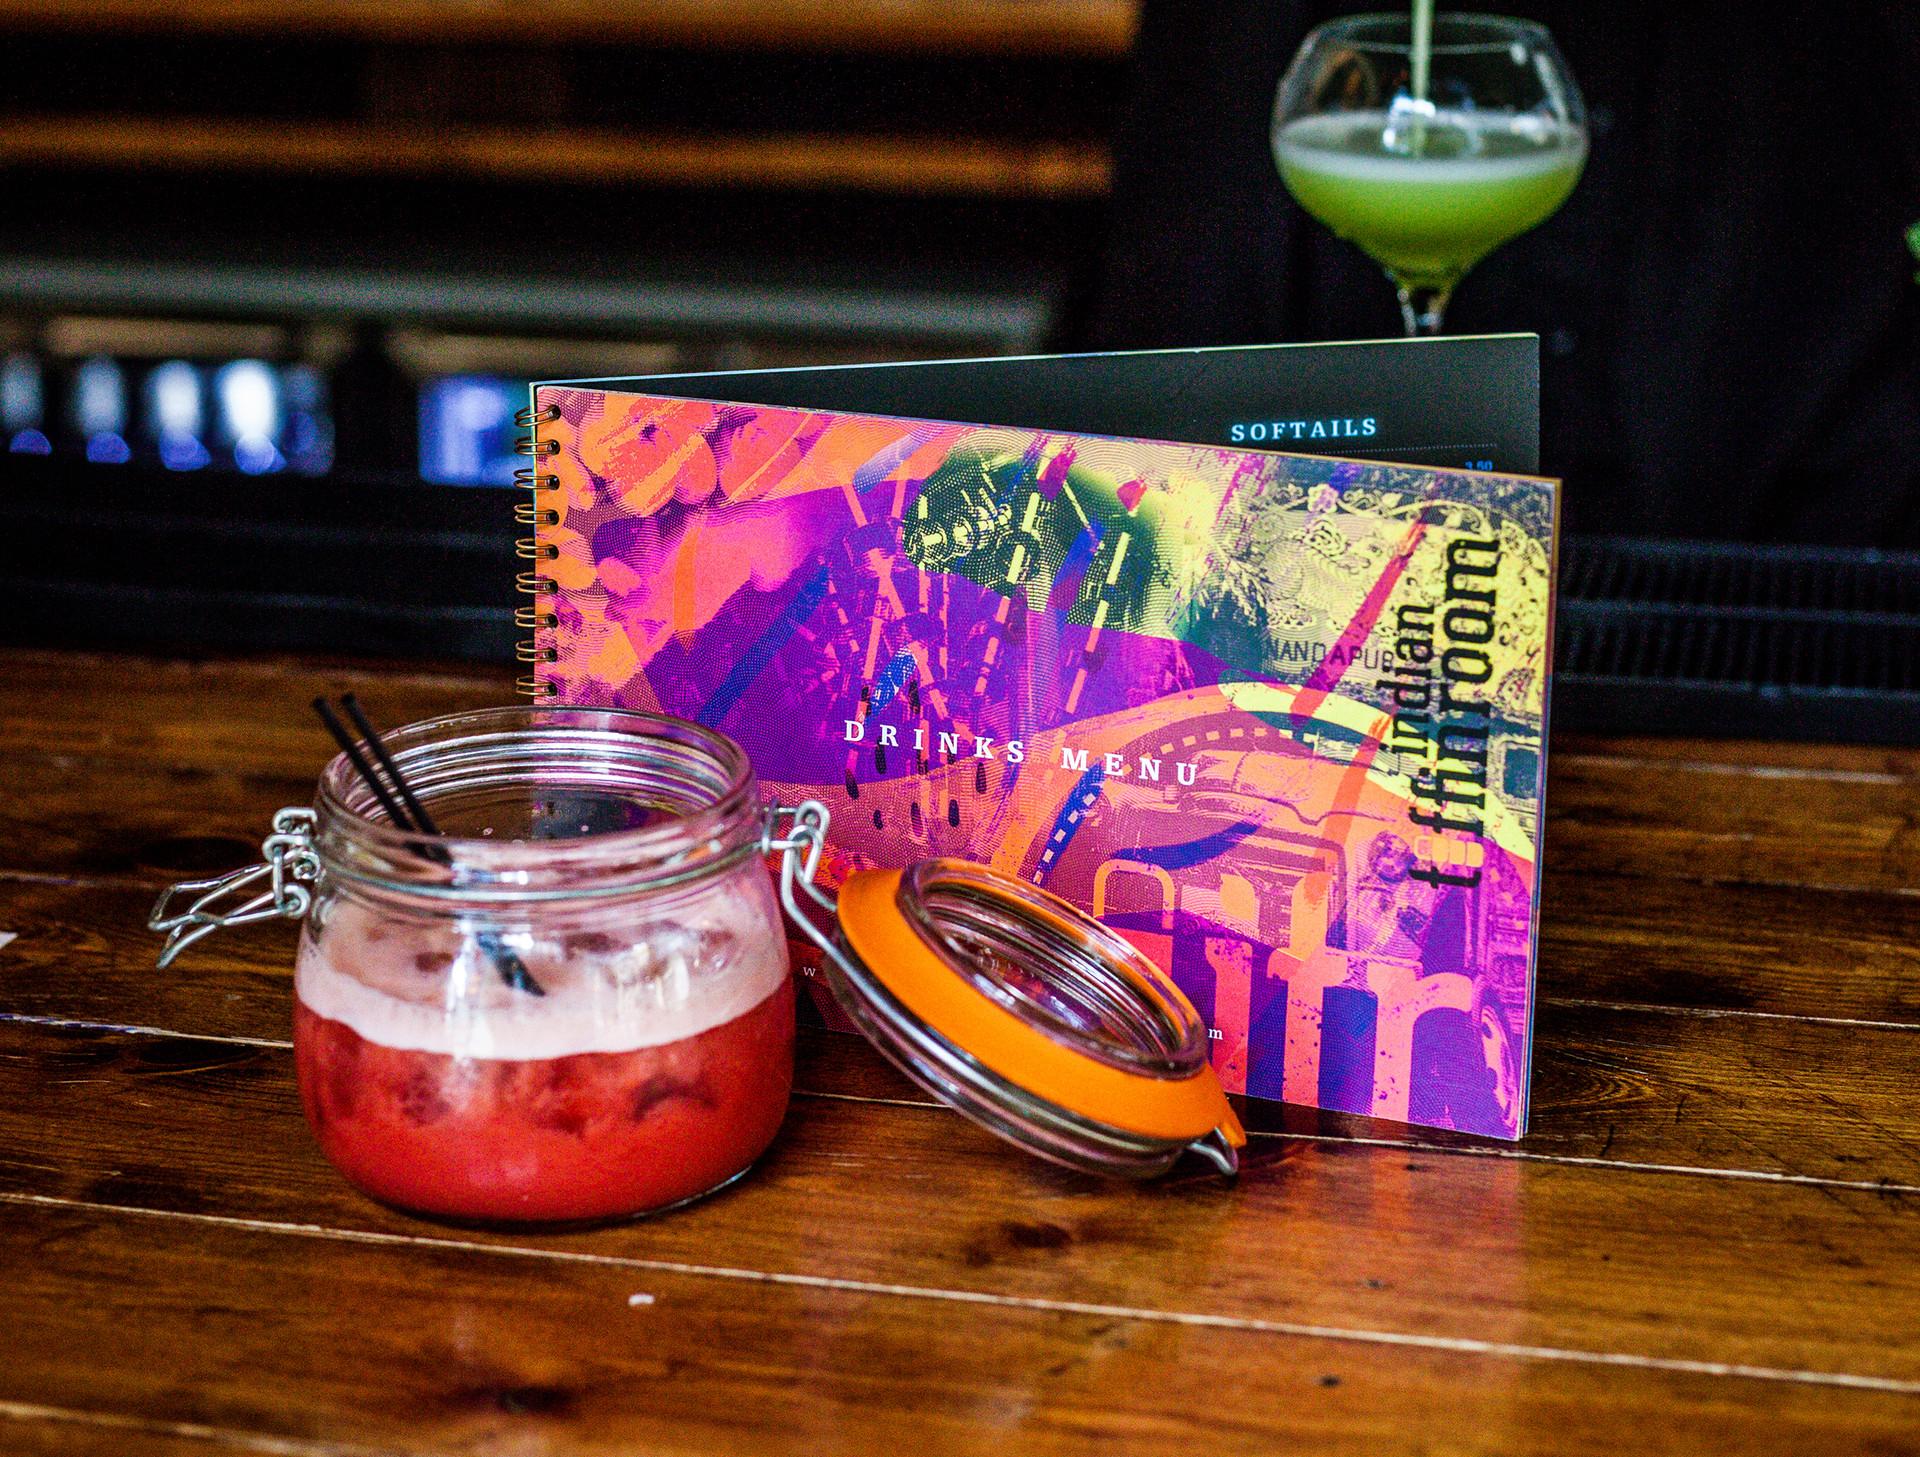 itr drinks menu 3.jpg